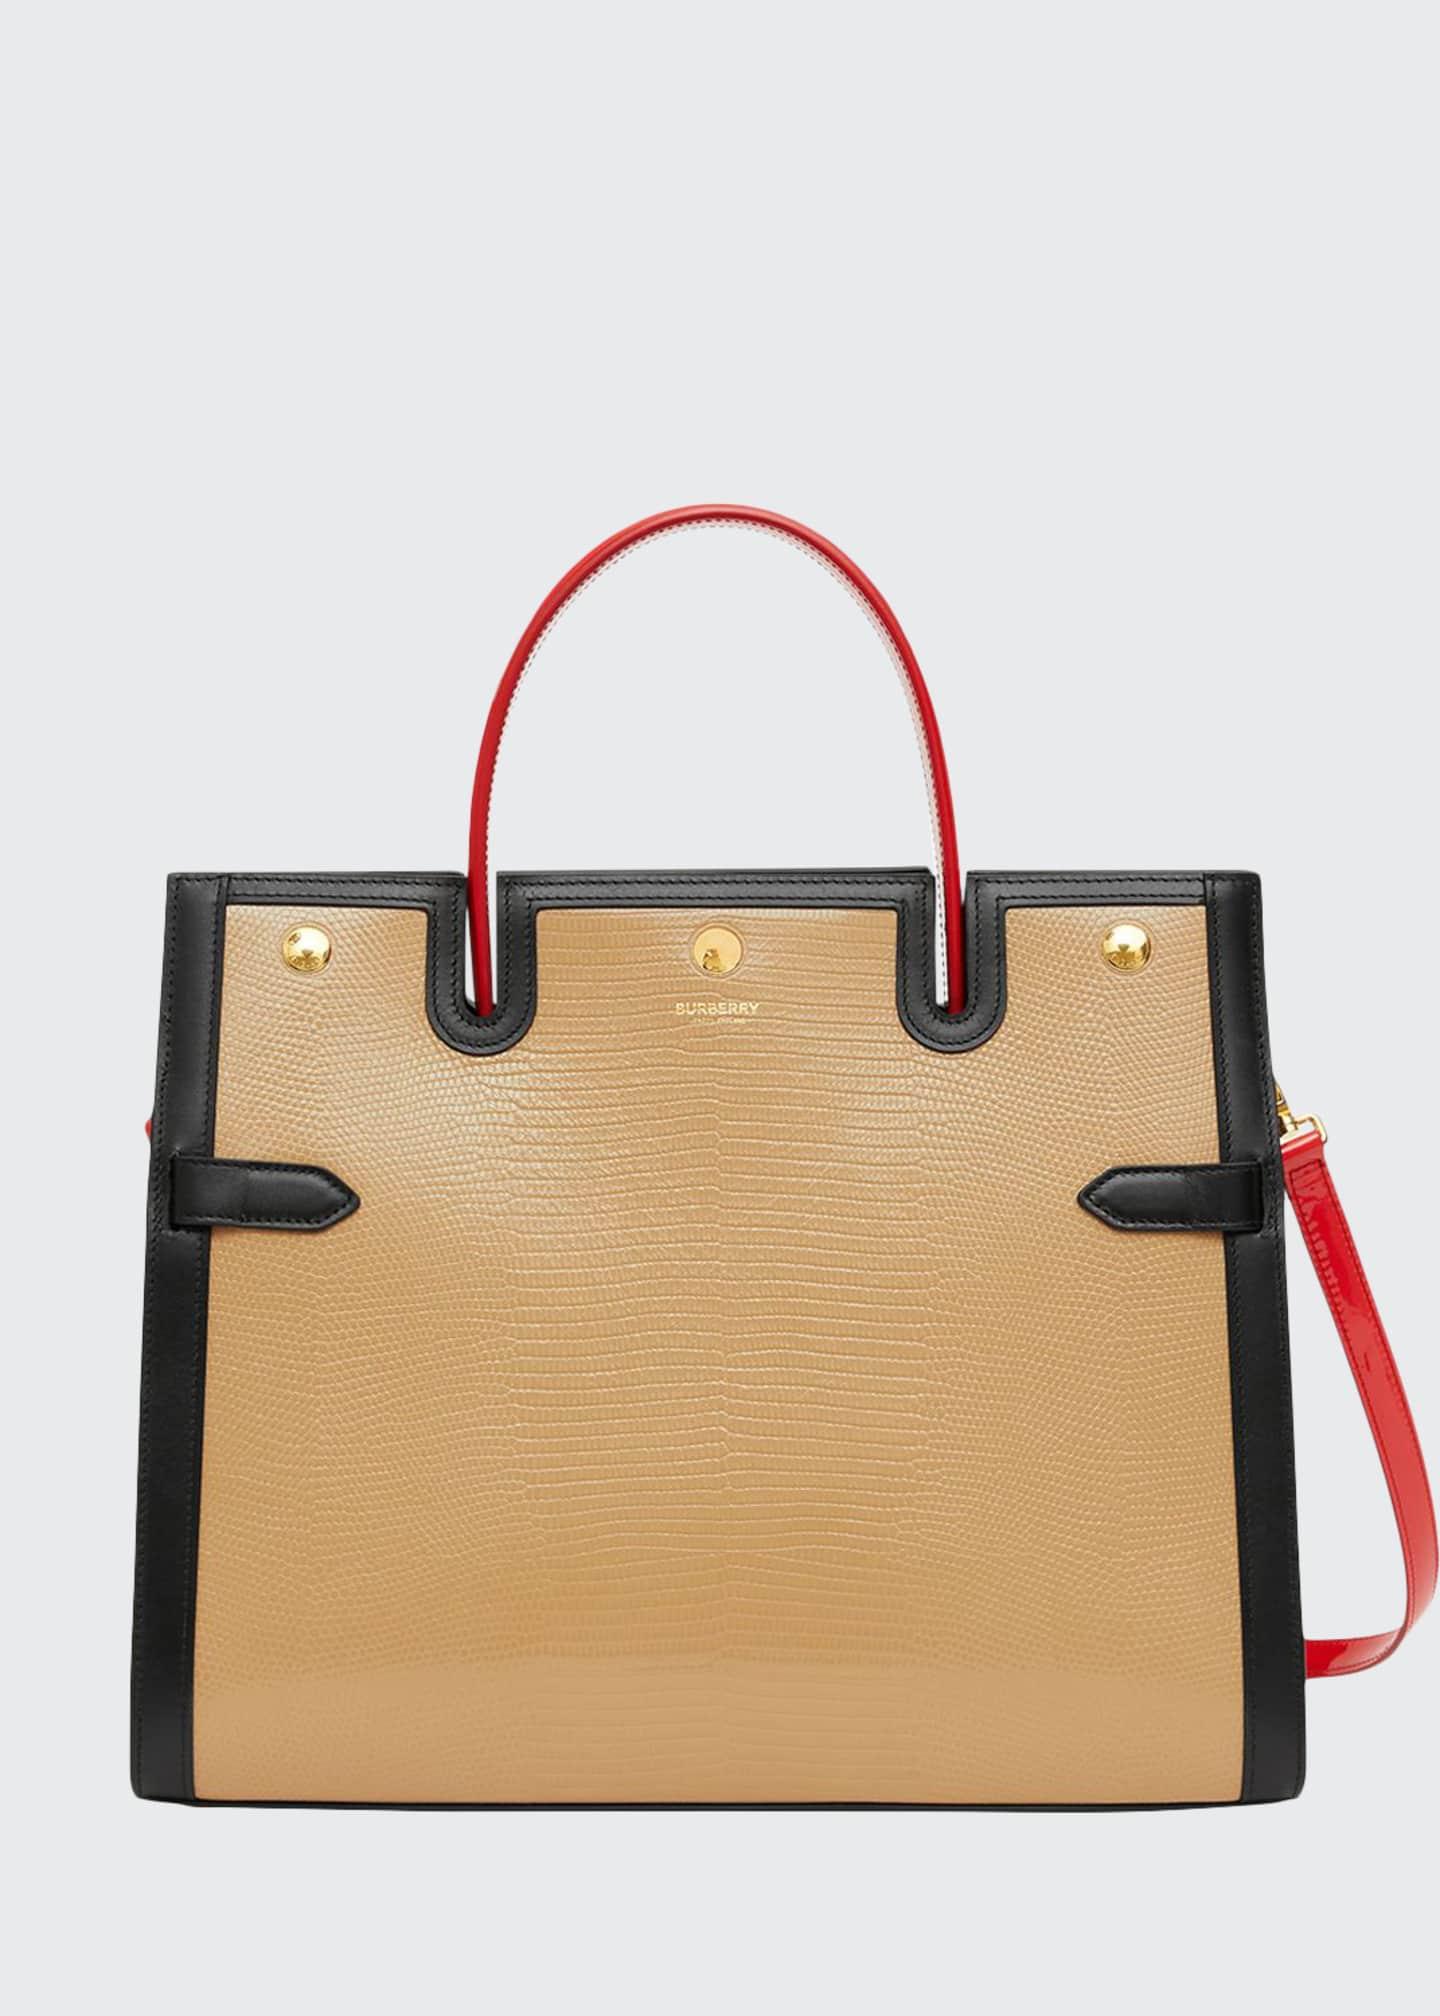 Burberry Lizard-Embossed Medium Top Handle Bag